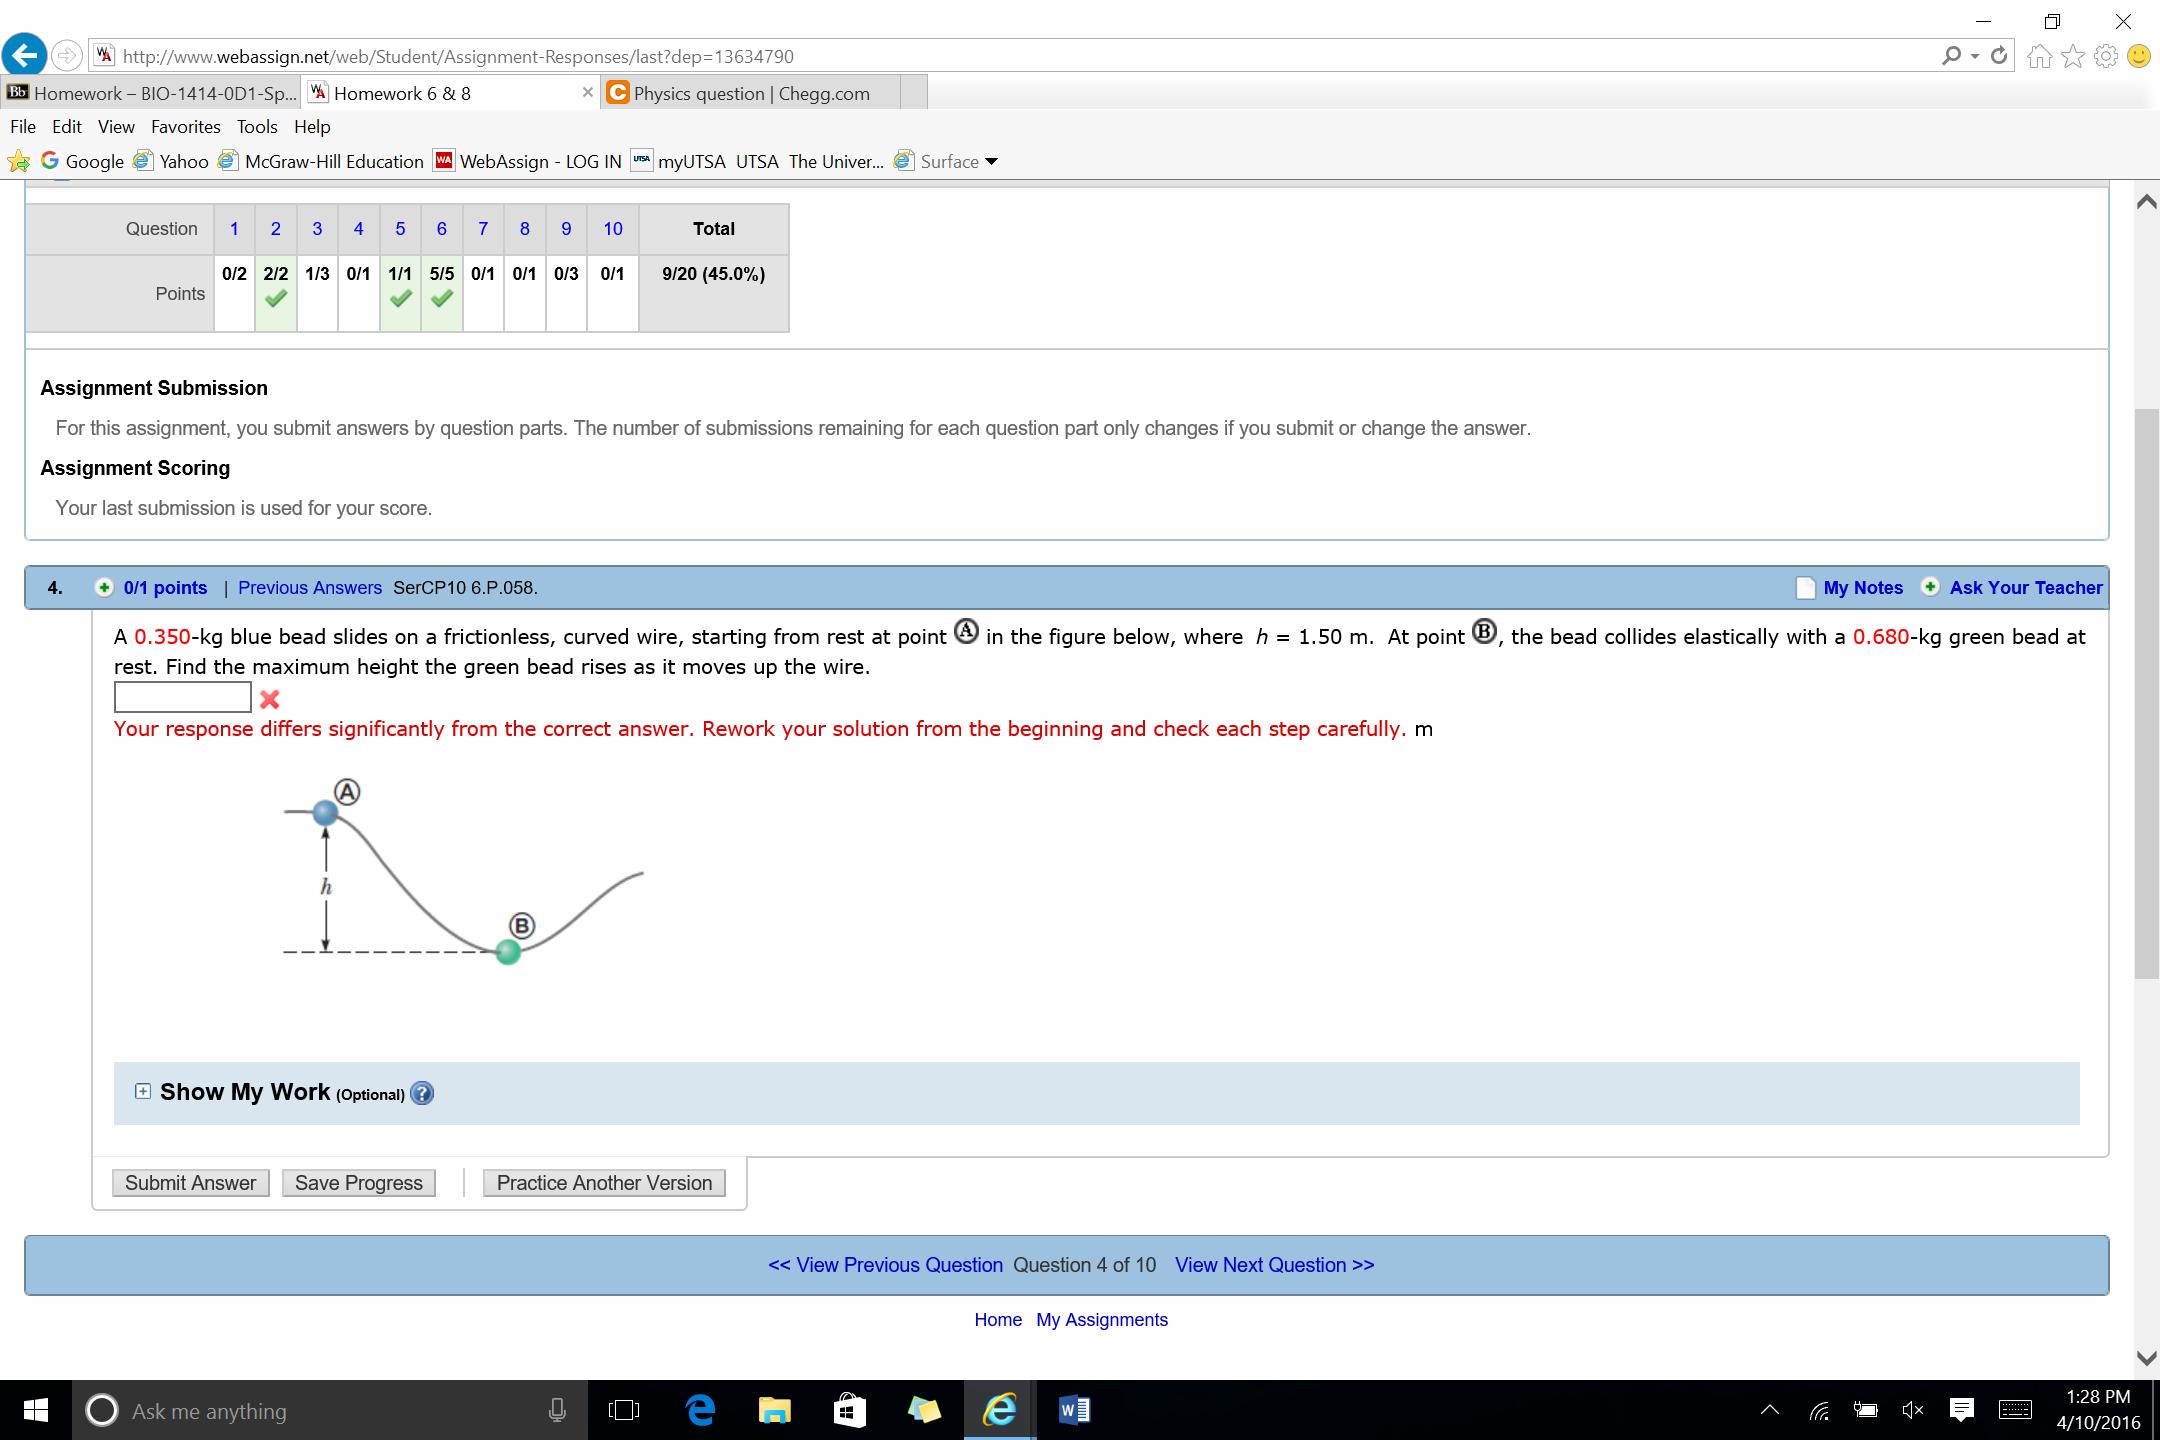 Solved: E>') 빗 Http://www webassign net/web/Student/Assig